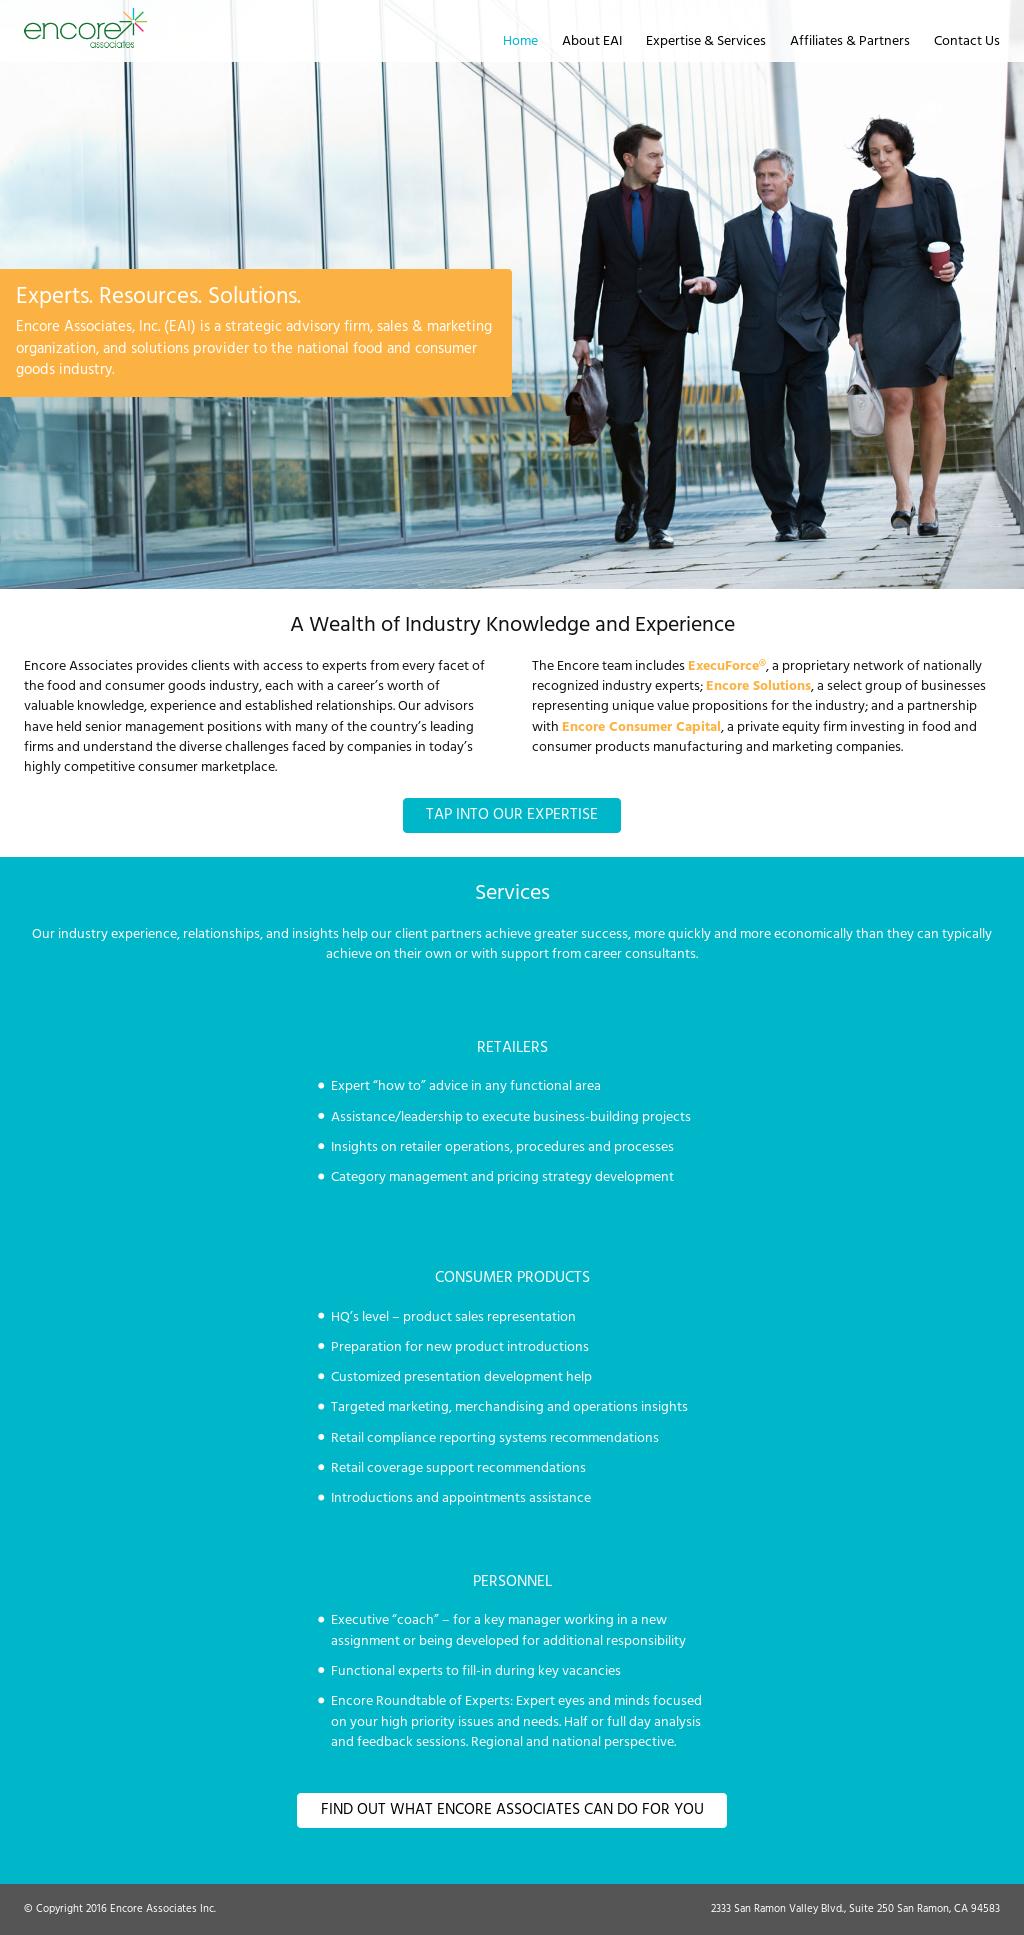 Encoreassociates Competitors, Revenue and Employees - Owler